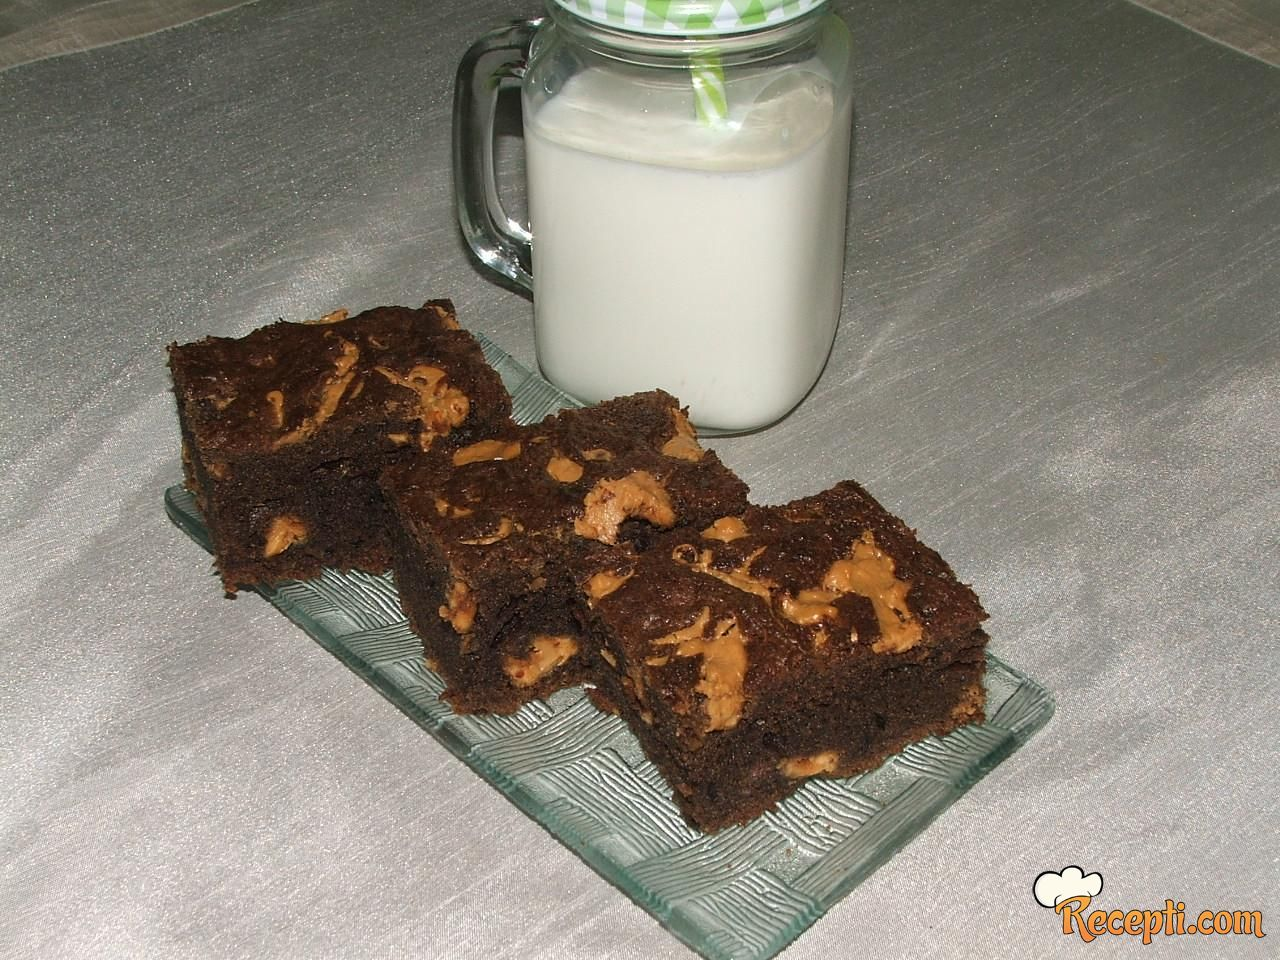 Čokoladne kocke sa kikiriki puterom